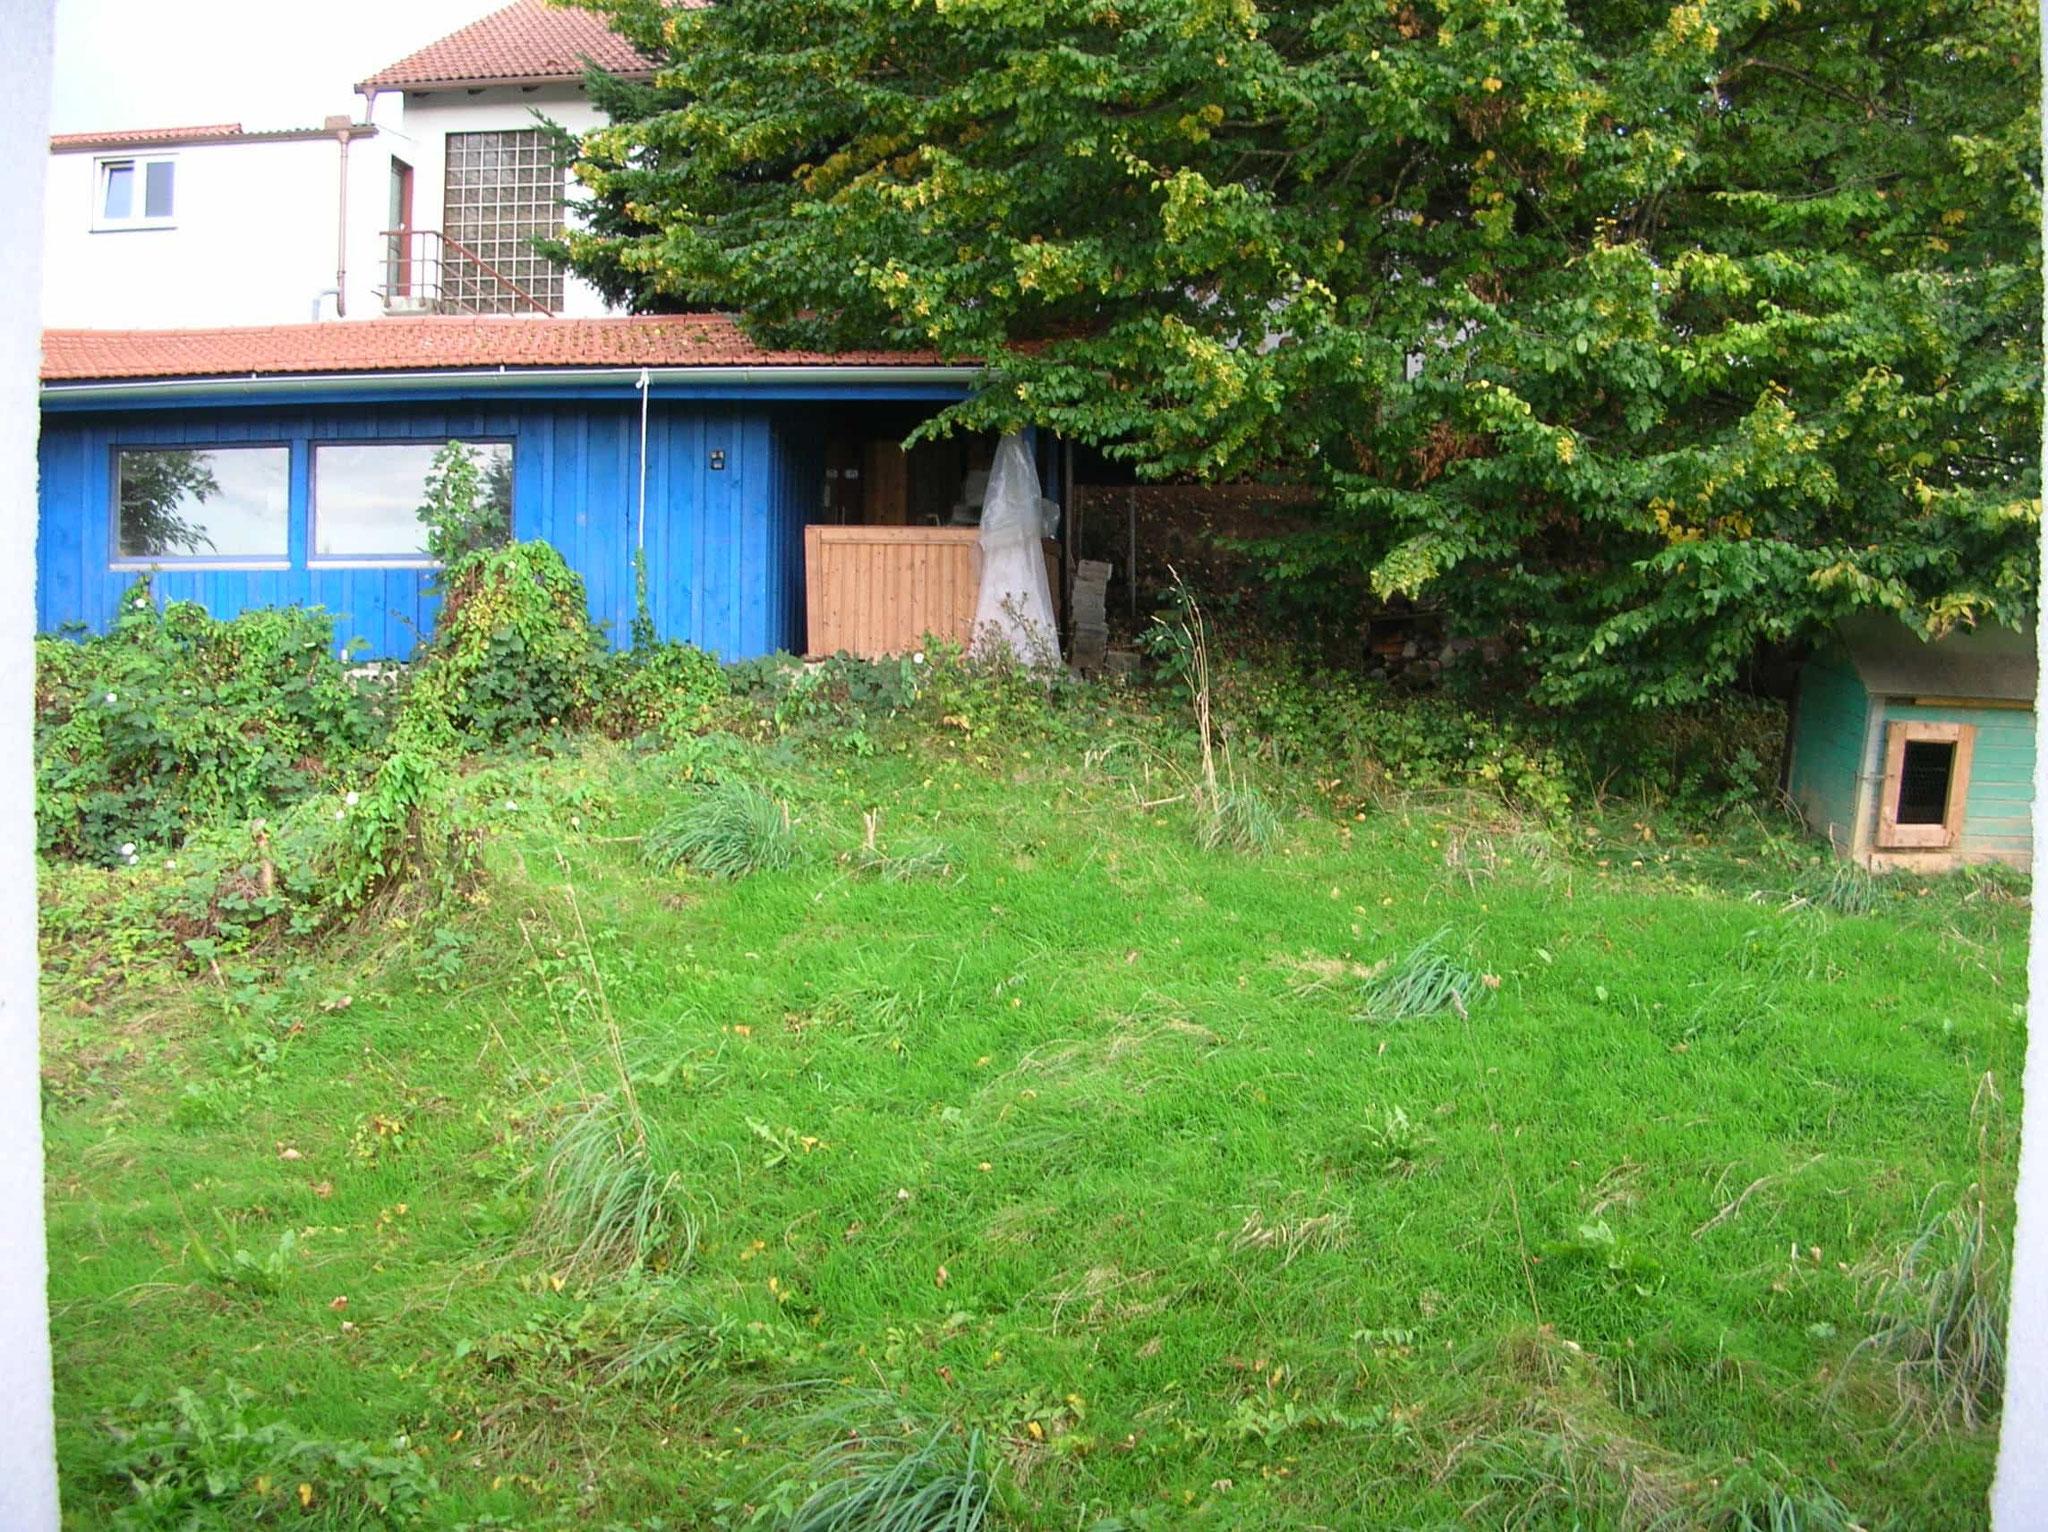 vor dem Gartenhaus, eher links